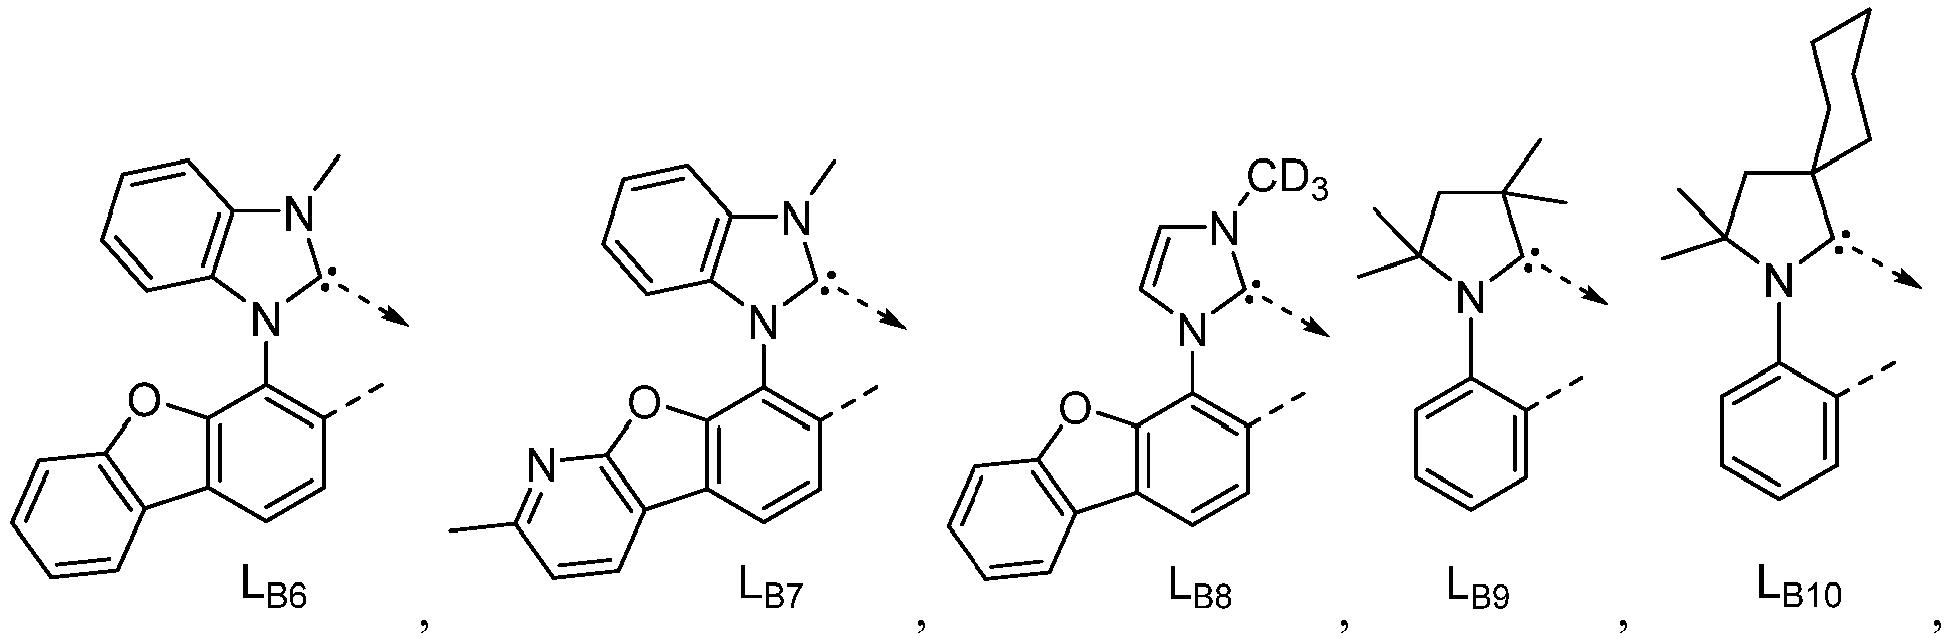 Figure imgb0808